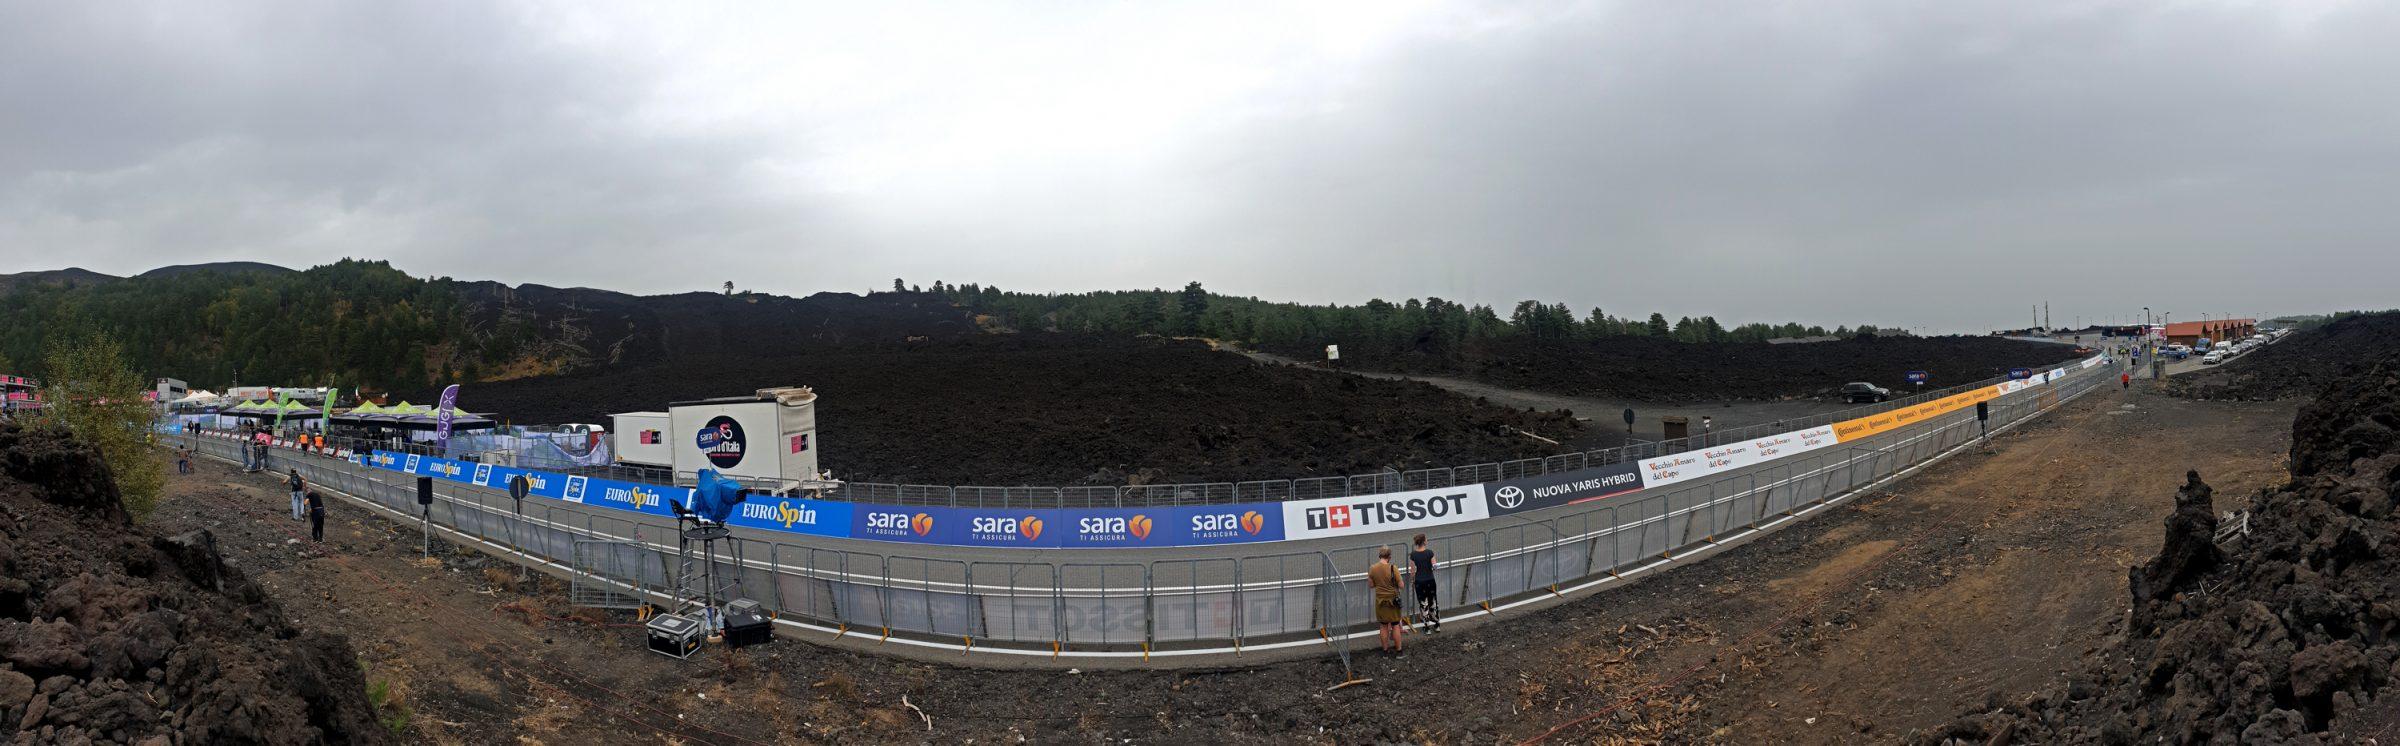 Giro d'Italia 2020 Etna Nord